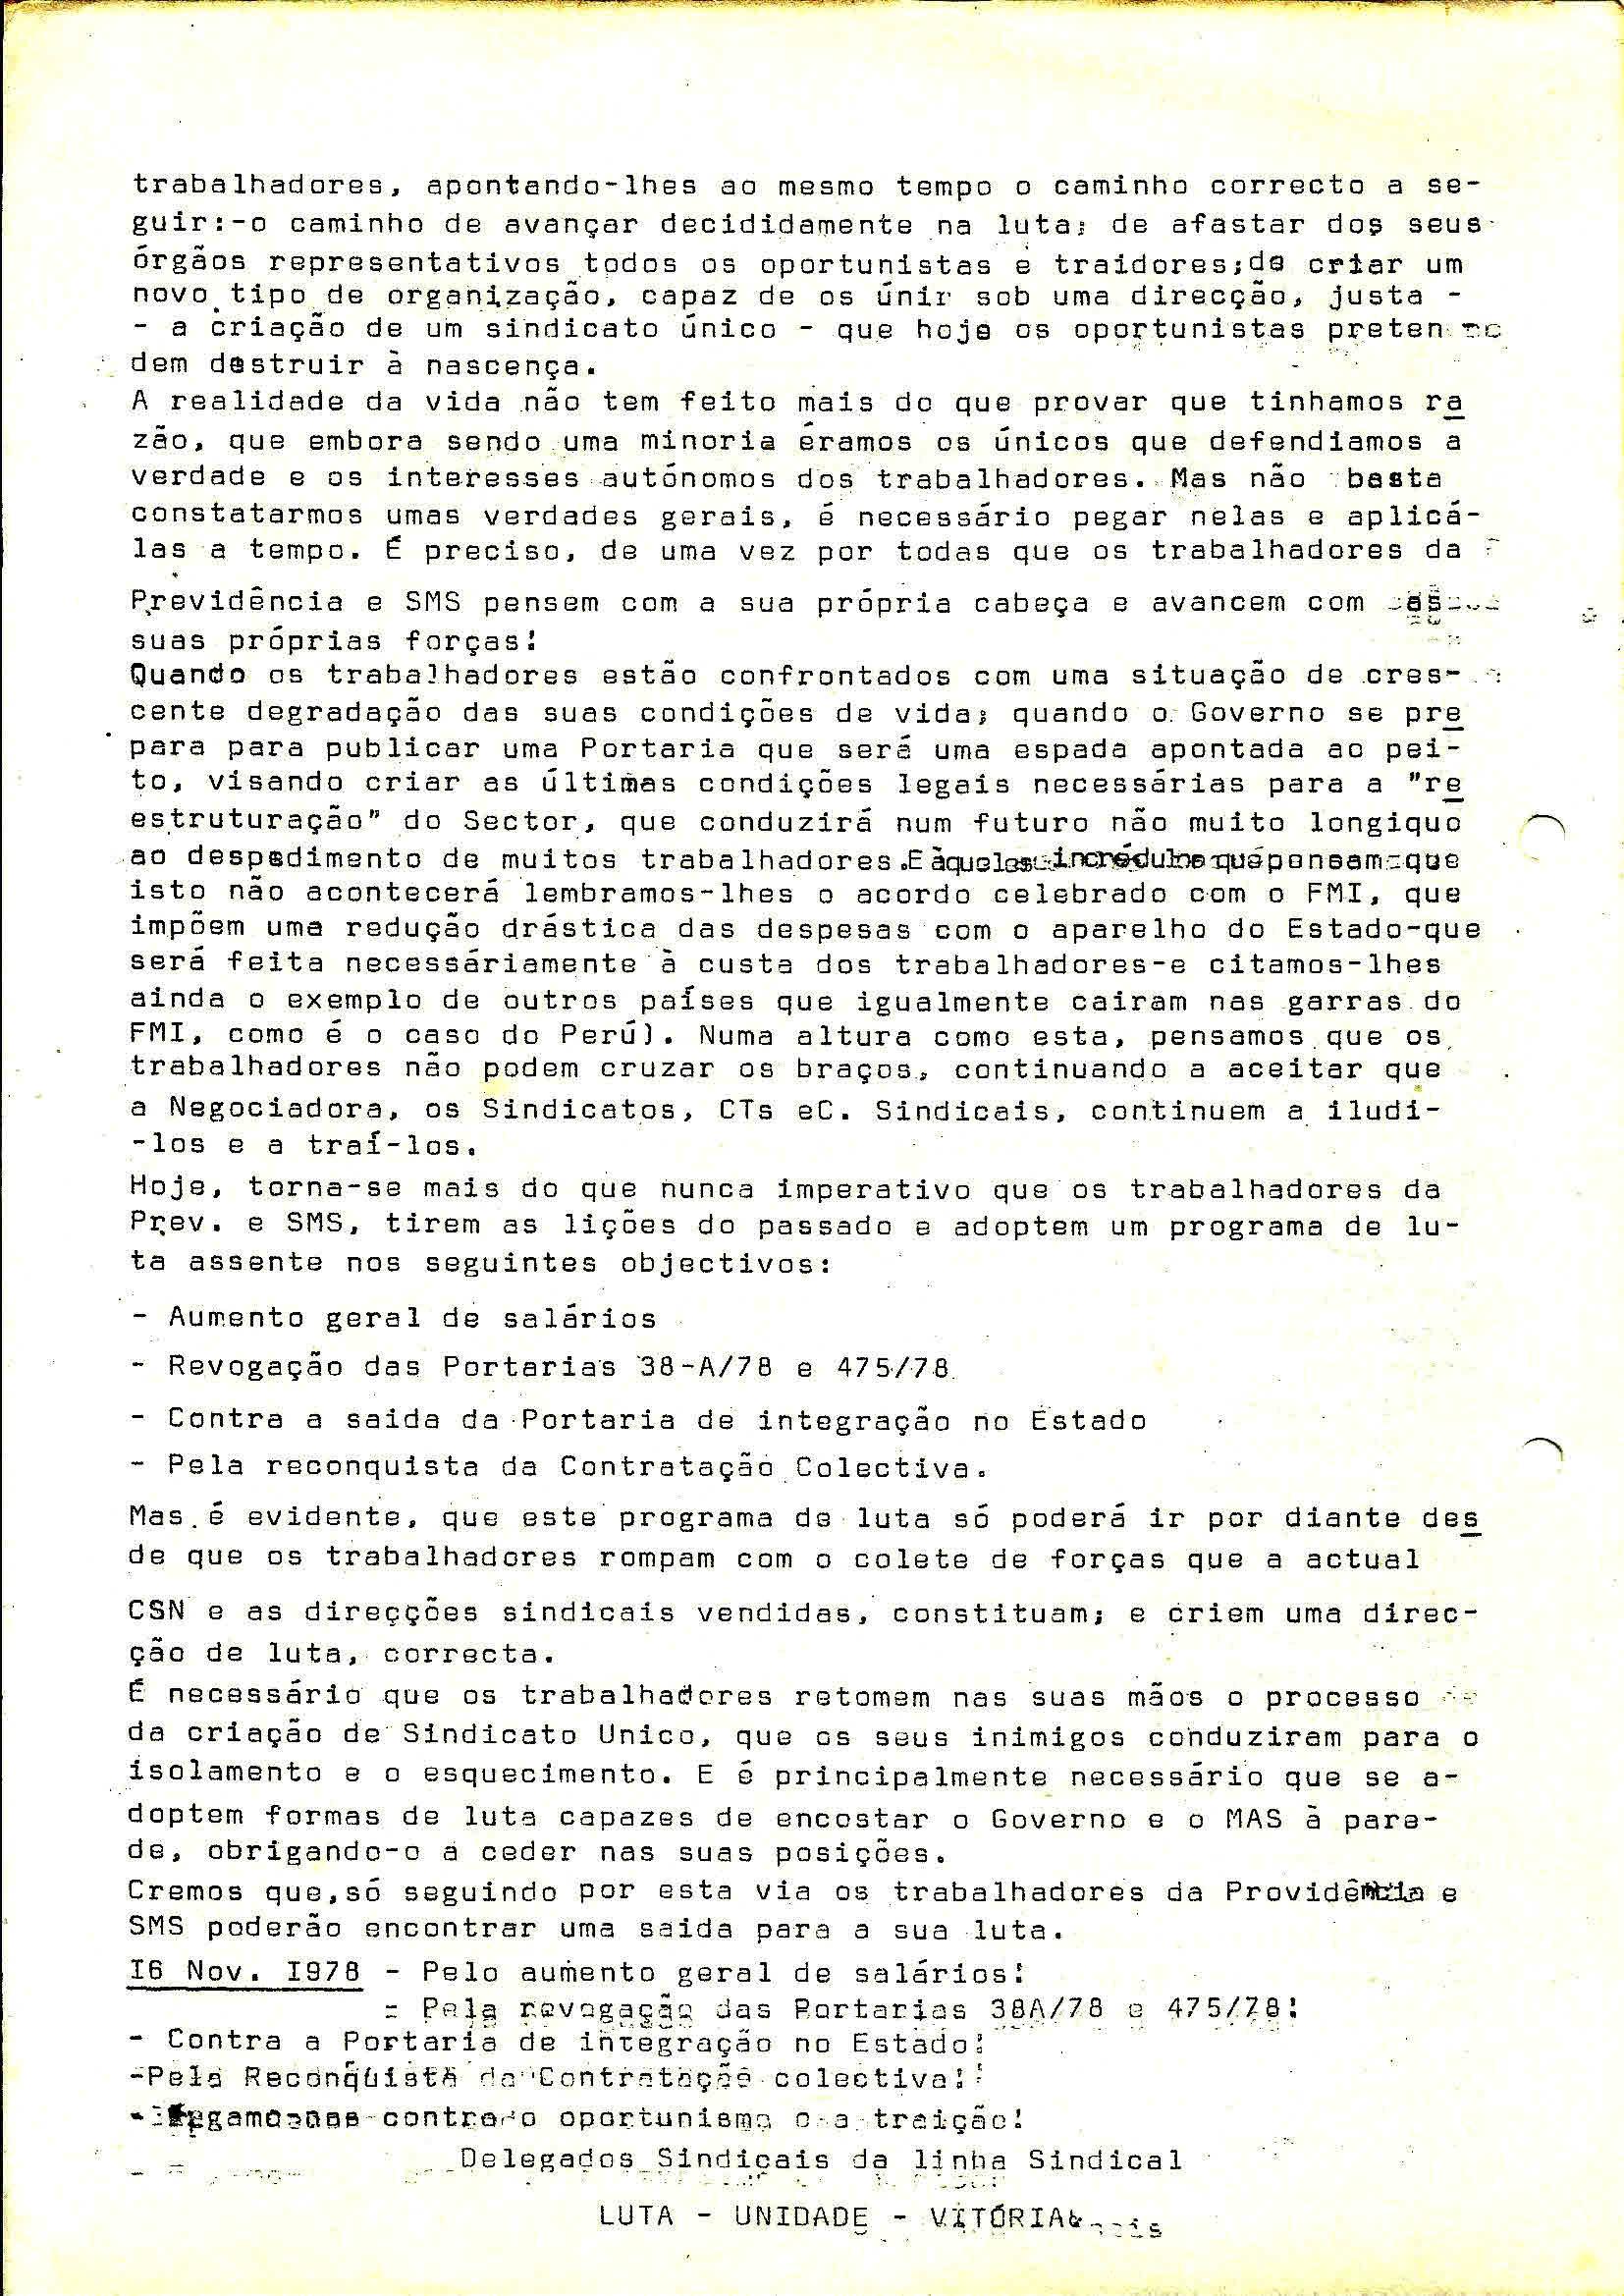 4 Sind Trab Previdência Aumento Salários Novembro 1978 2